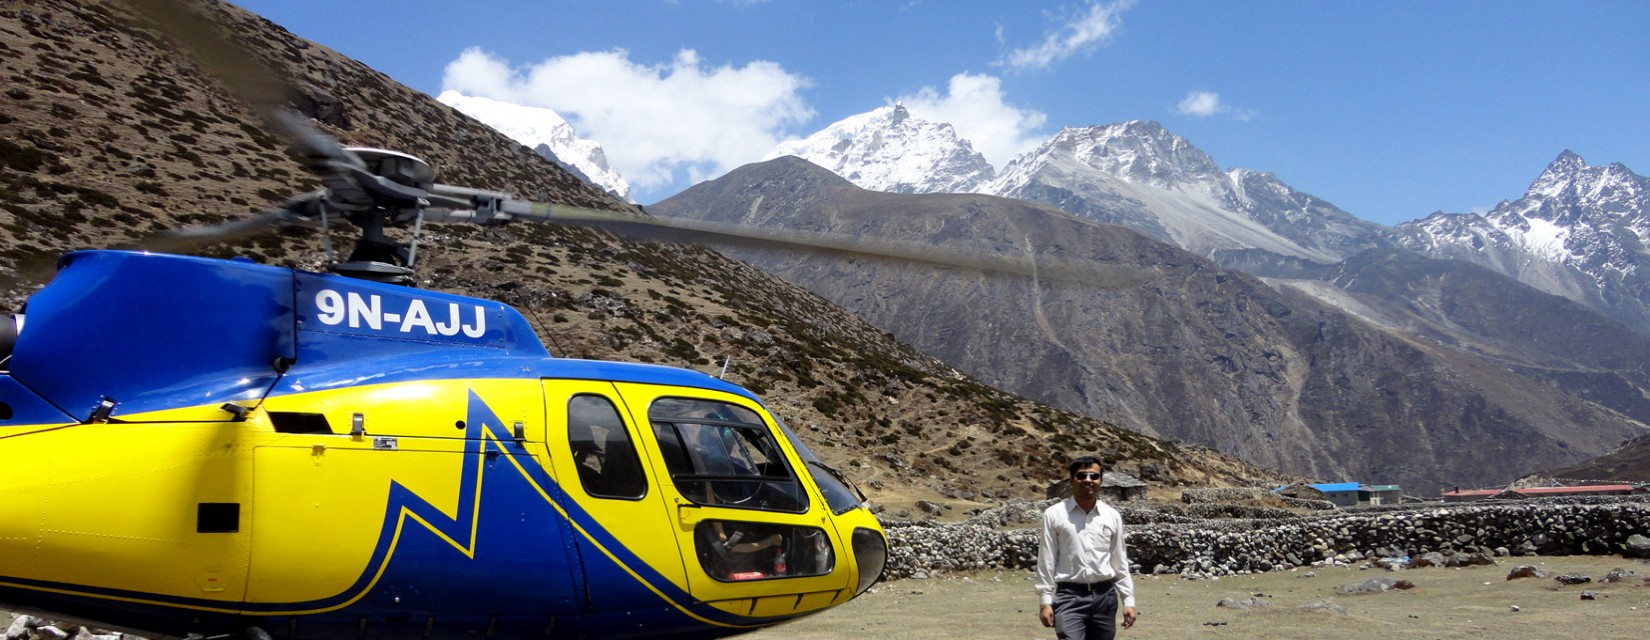 Heli Tour en Nepal